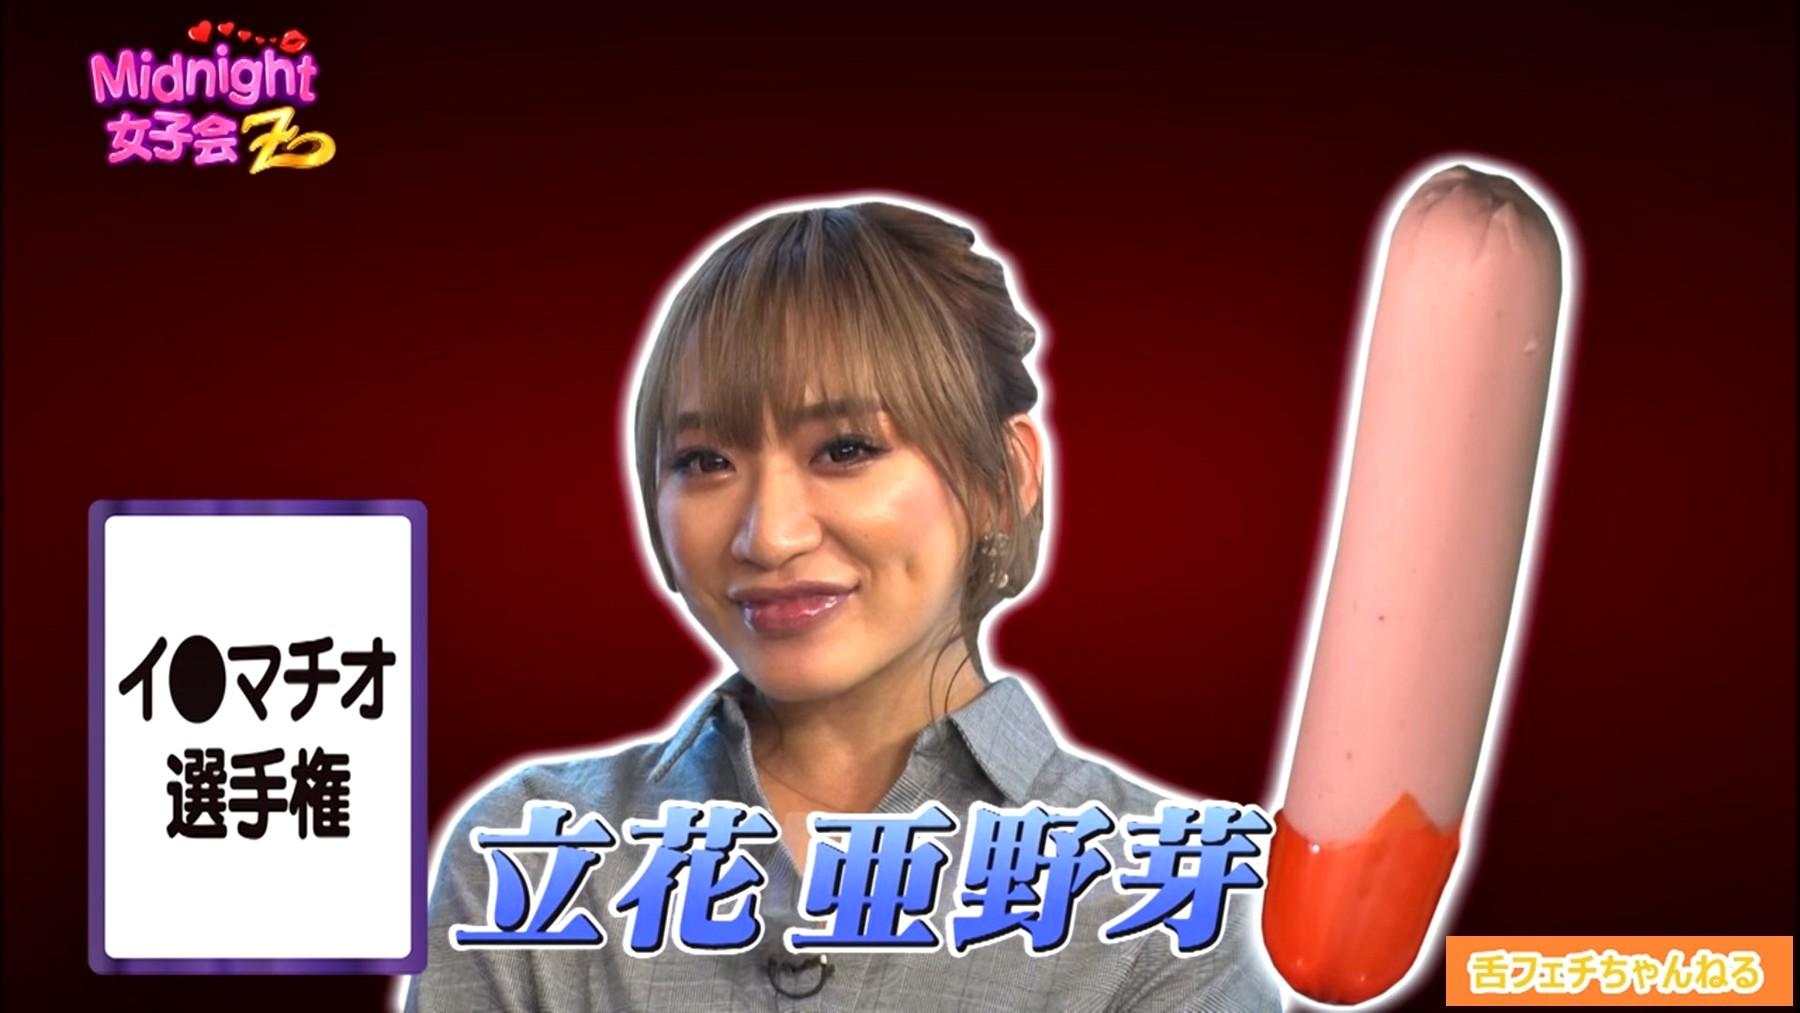 Midnight女子会 イラマチオ選手権 (35)